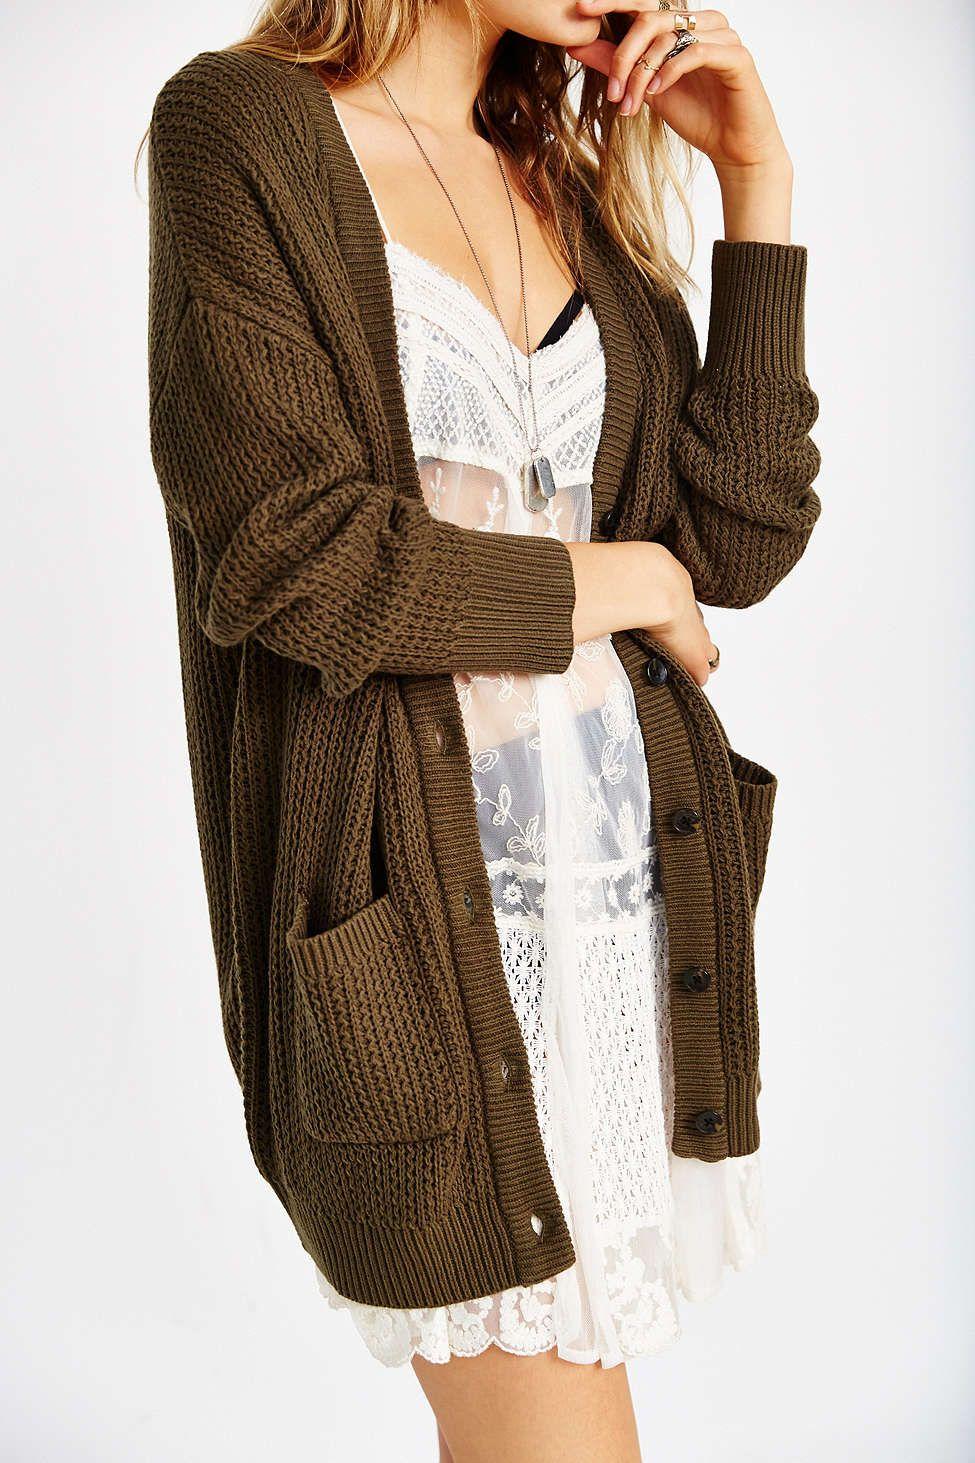 i really need a chunky knit sweater | Hot Fashion | Pinterest ...